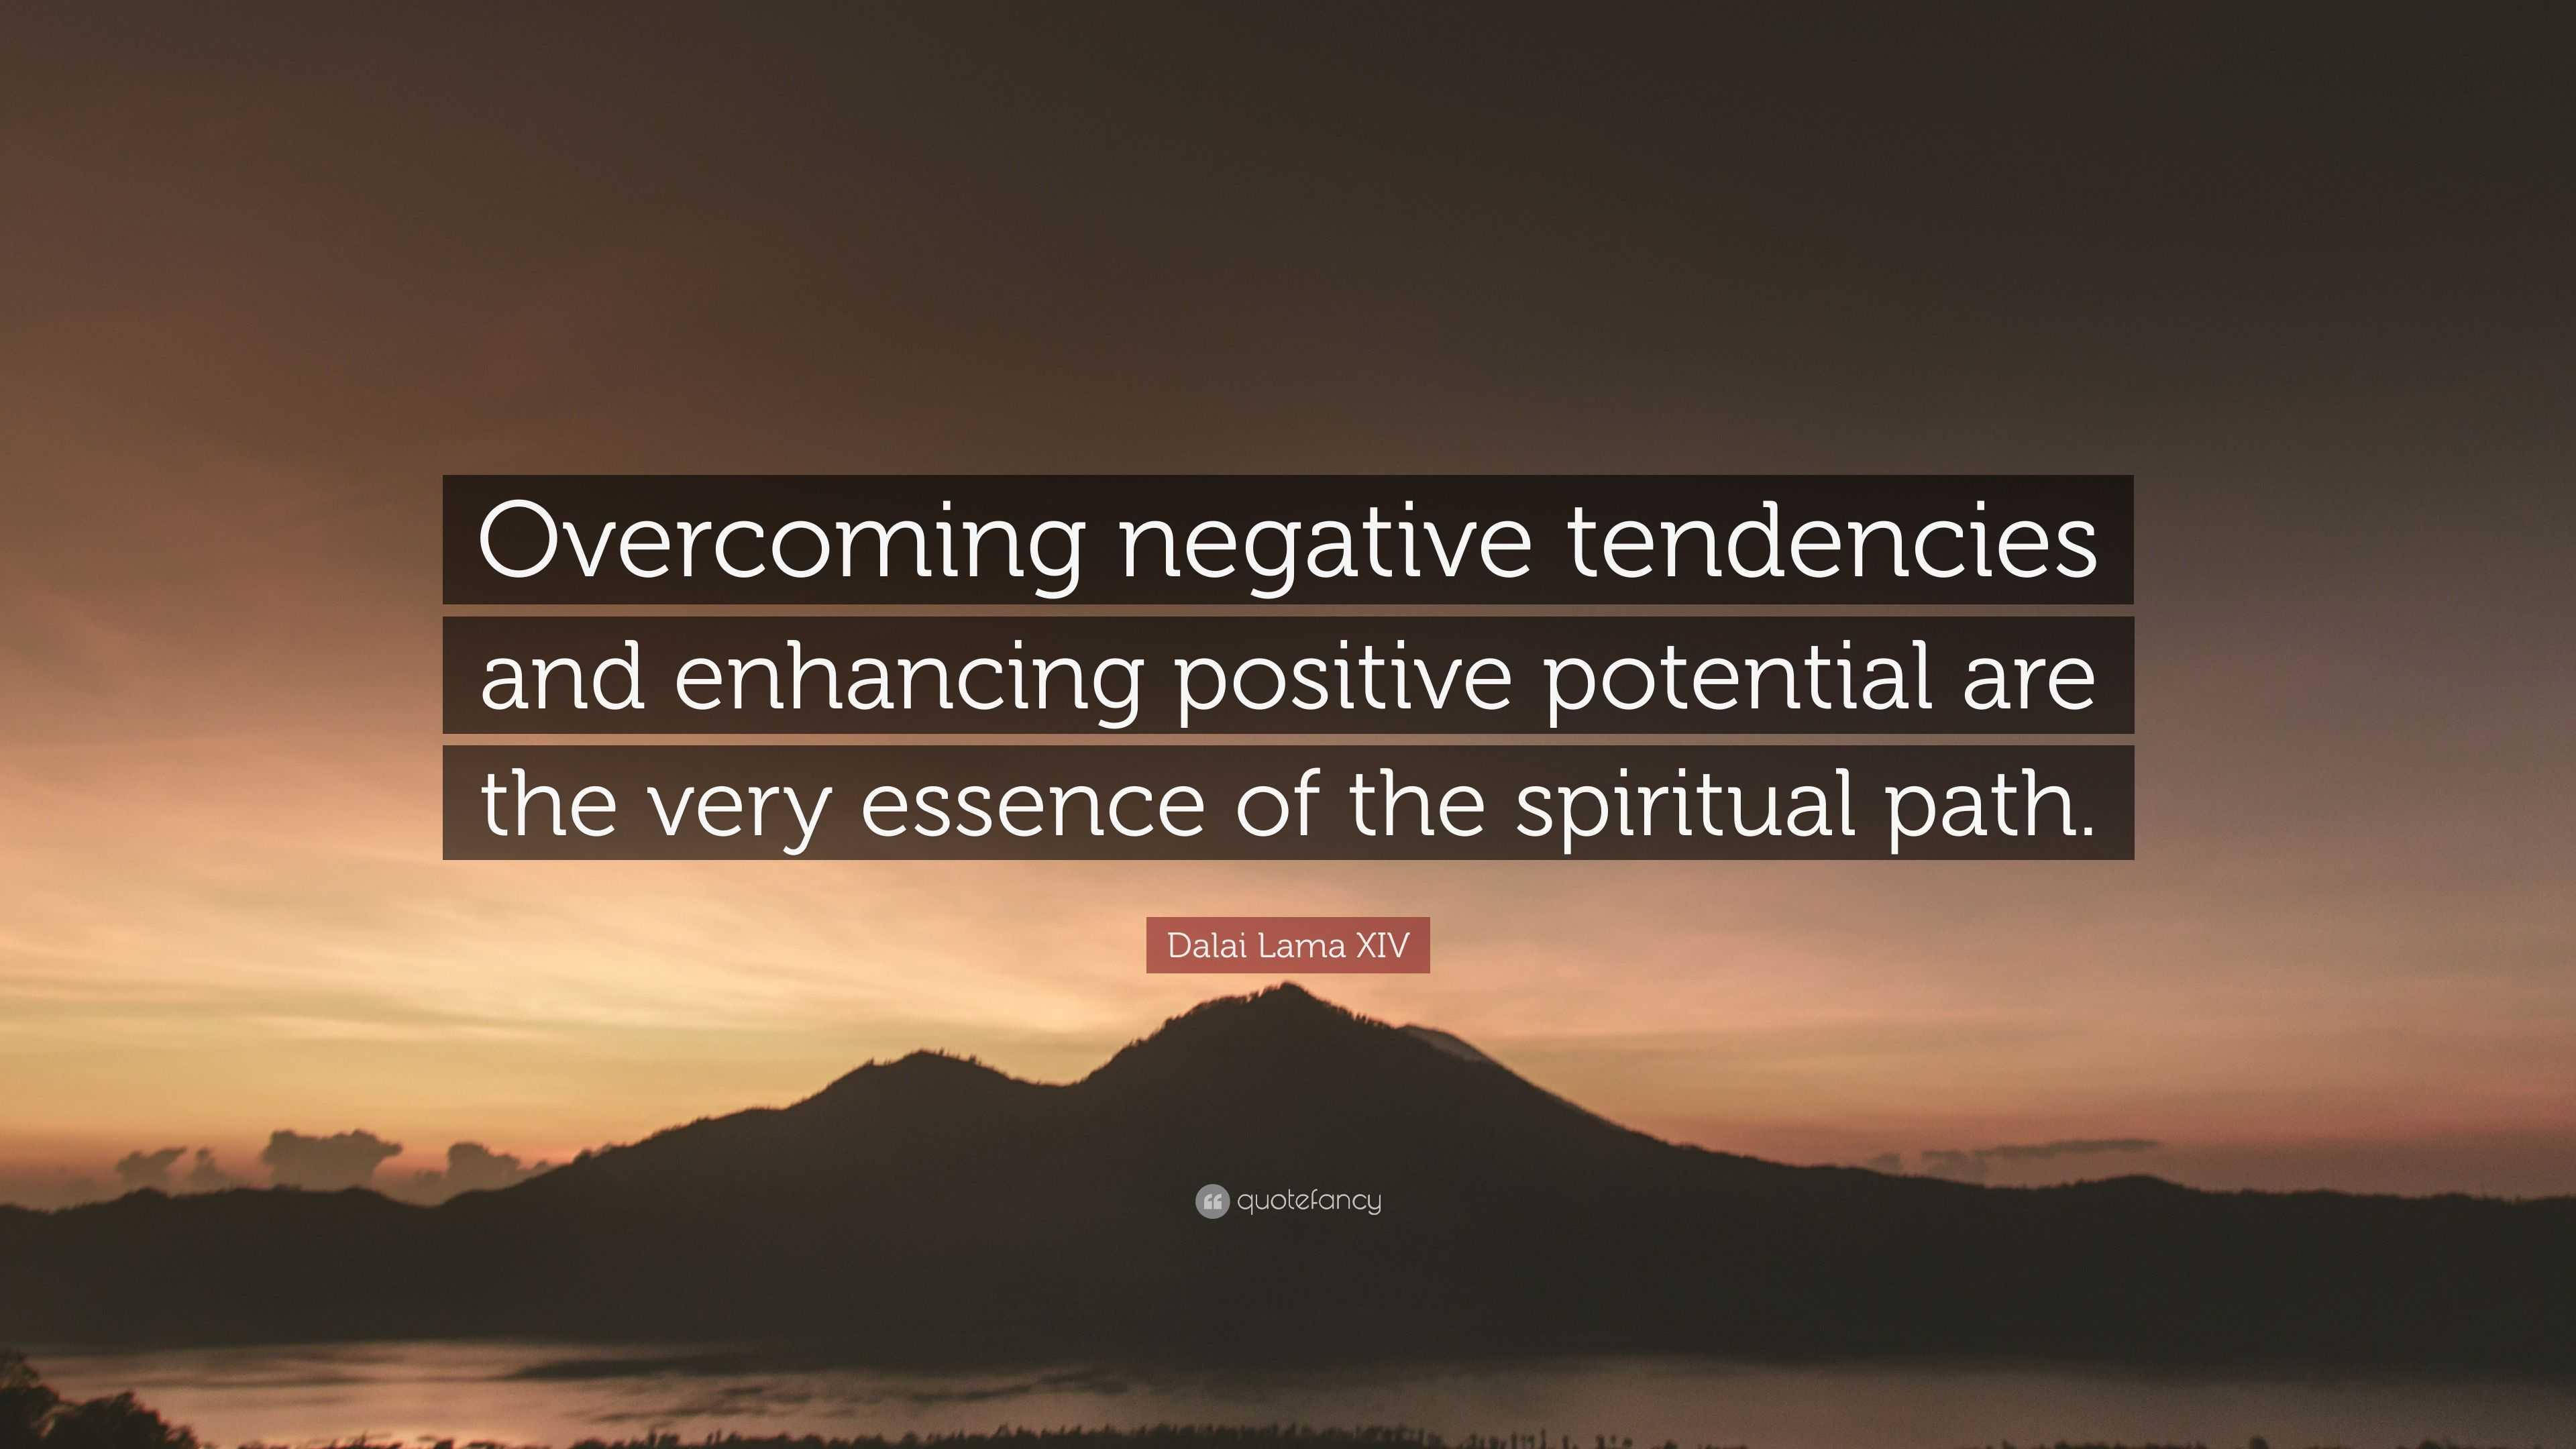 Dalai Lama Xiv Quote Overcoming Negative Tendencies And border=